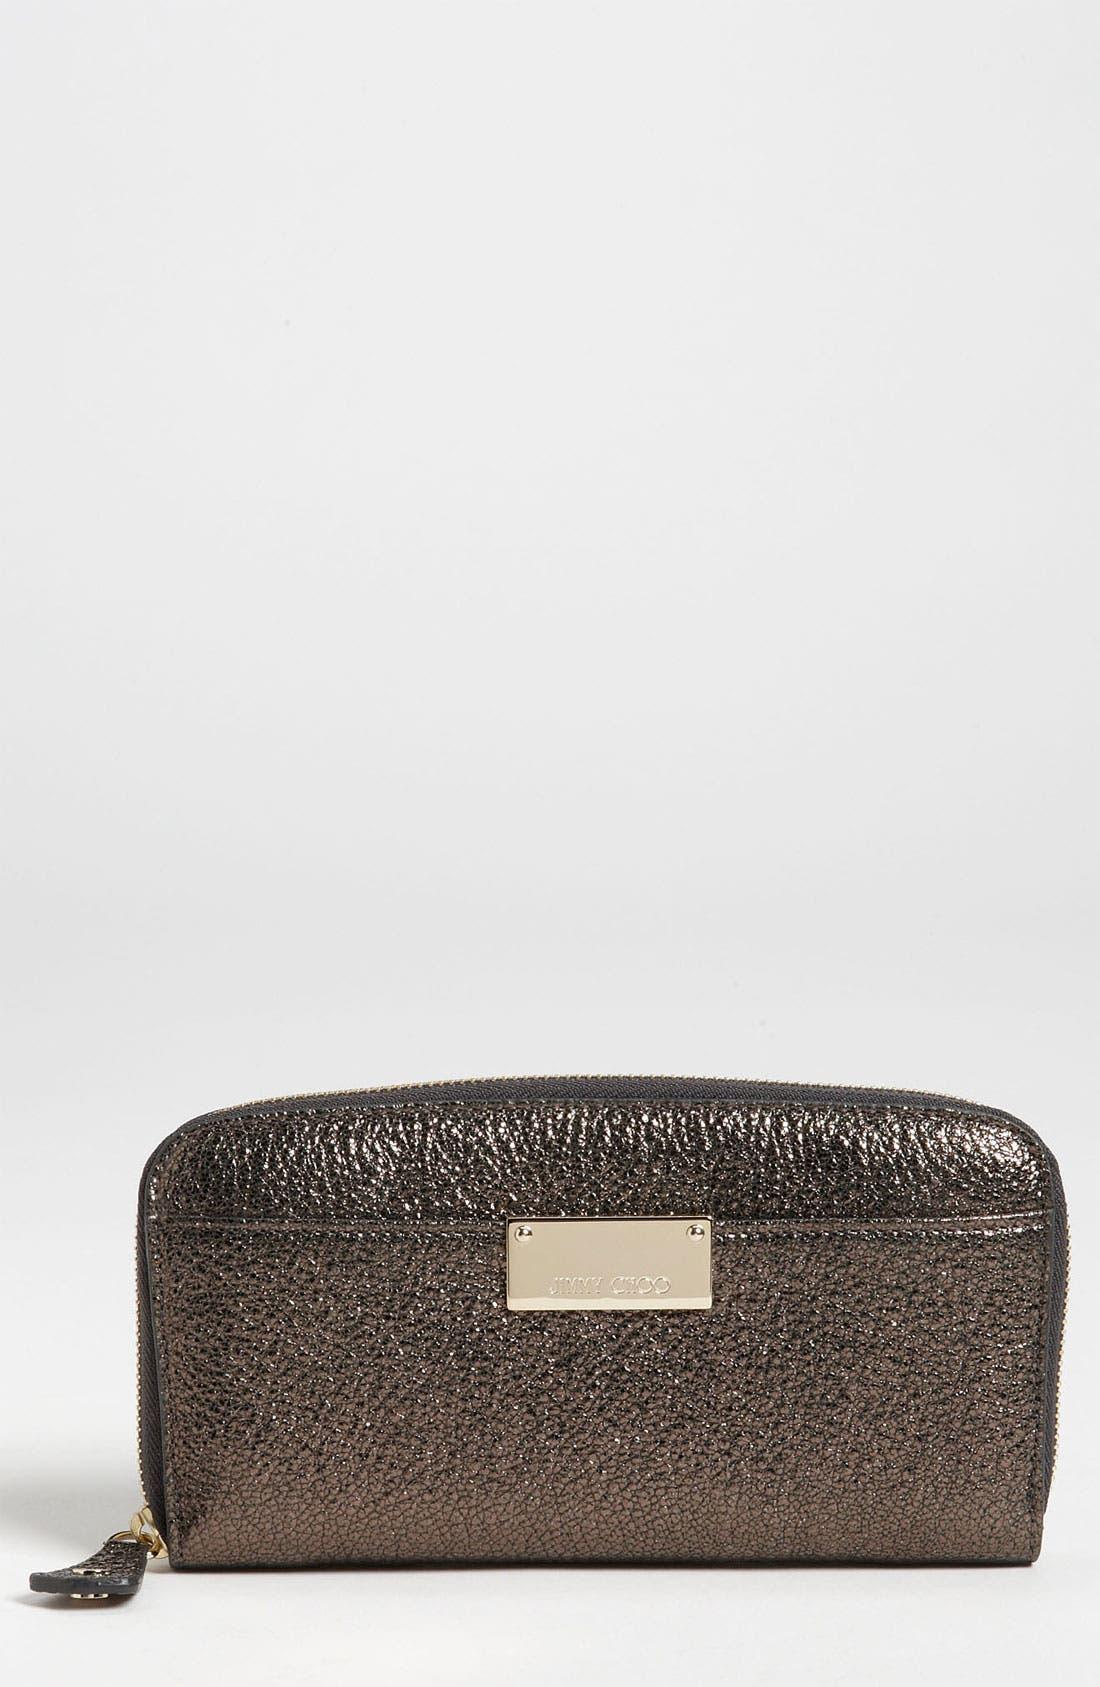 Alternate Image 1 Selected - Jimmy Choo 'Rush' Glitter Leather Wallet